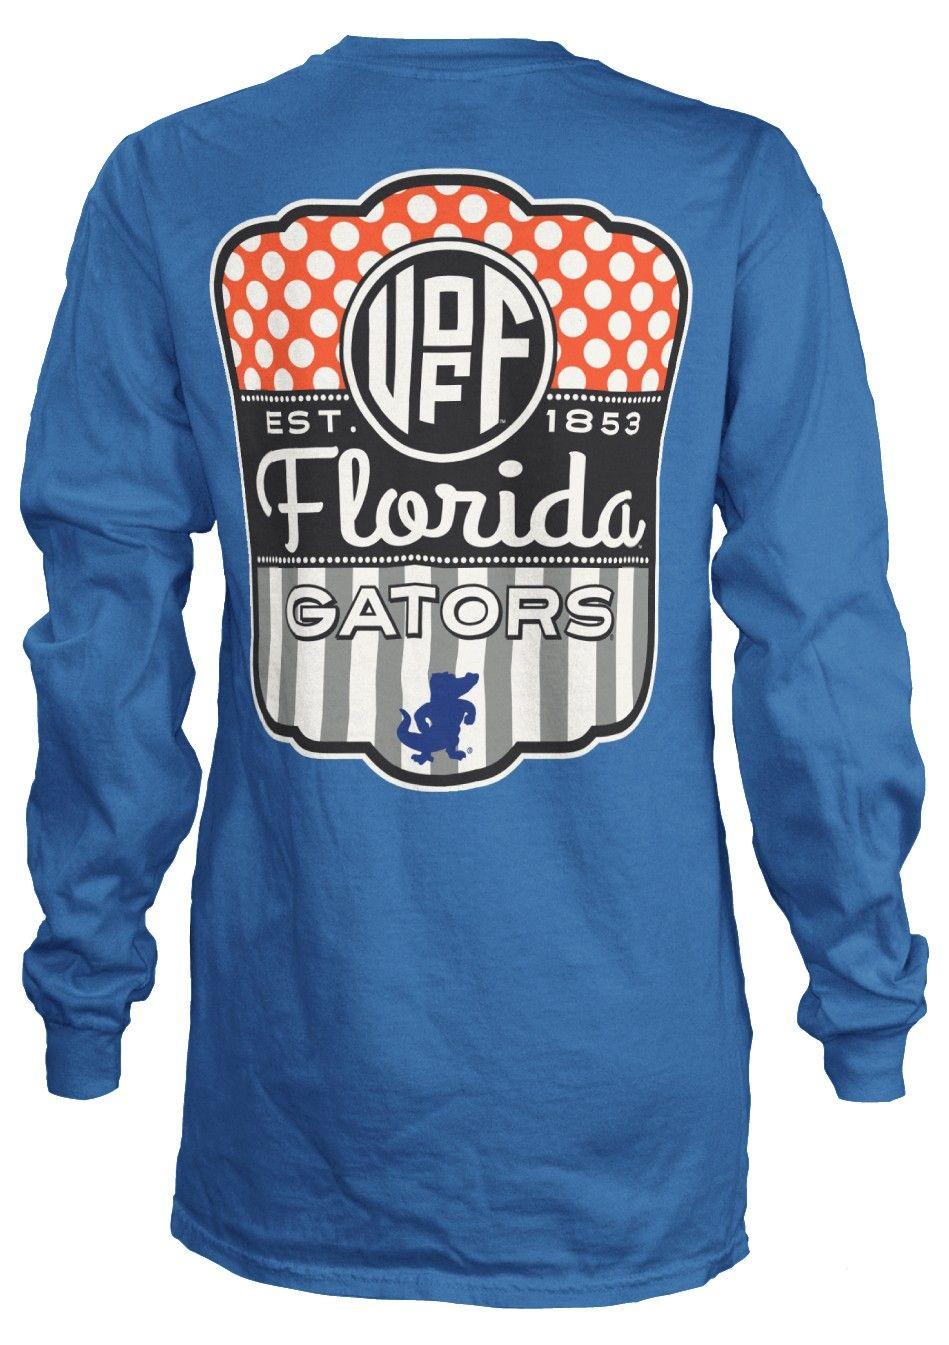 62af7cfc22b University of Florida Gators Long Sleeved T-Shirt  UF  GoGators   beallsflorida